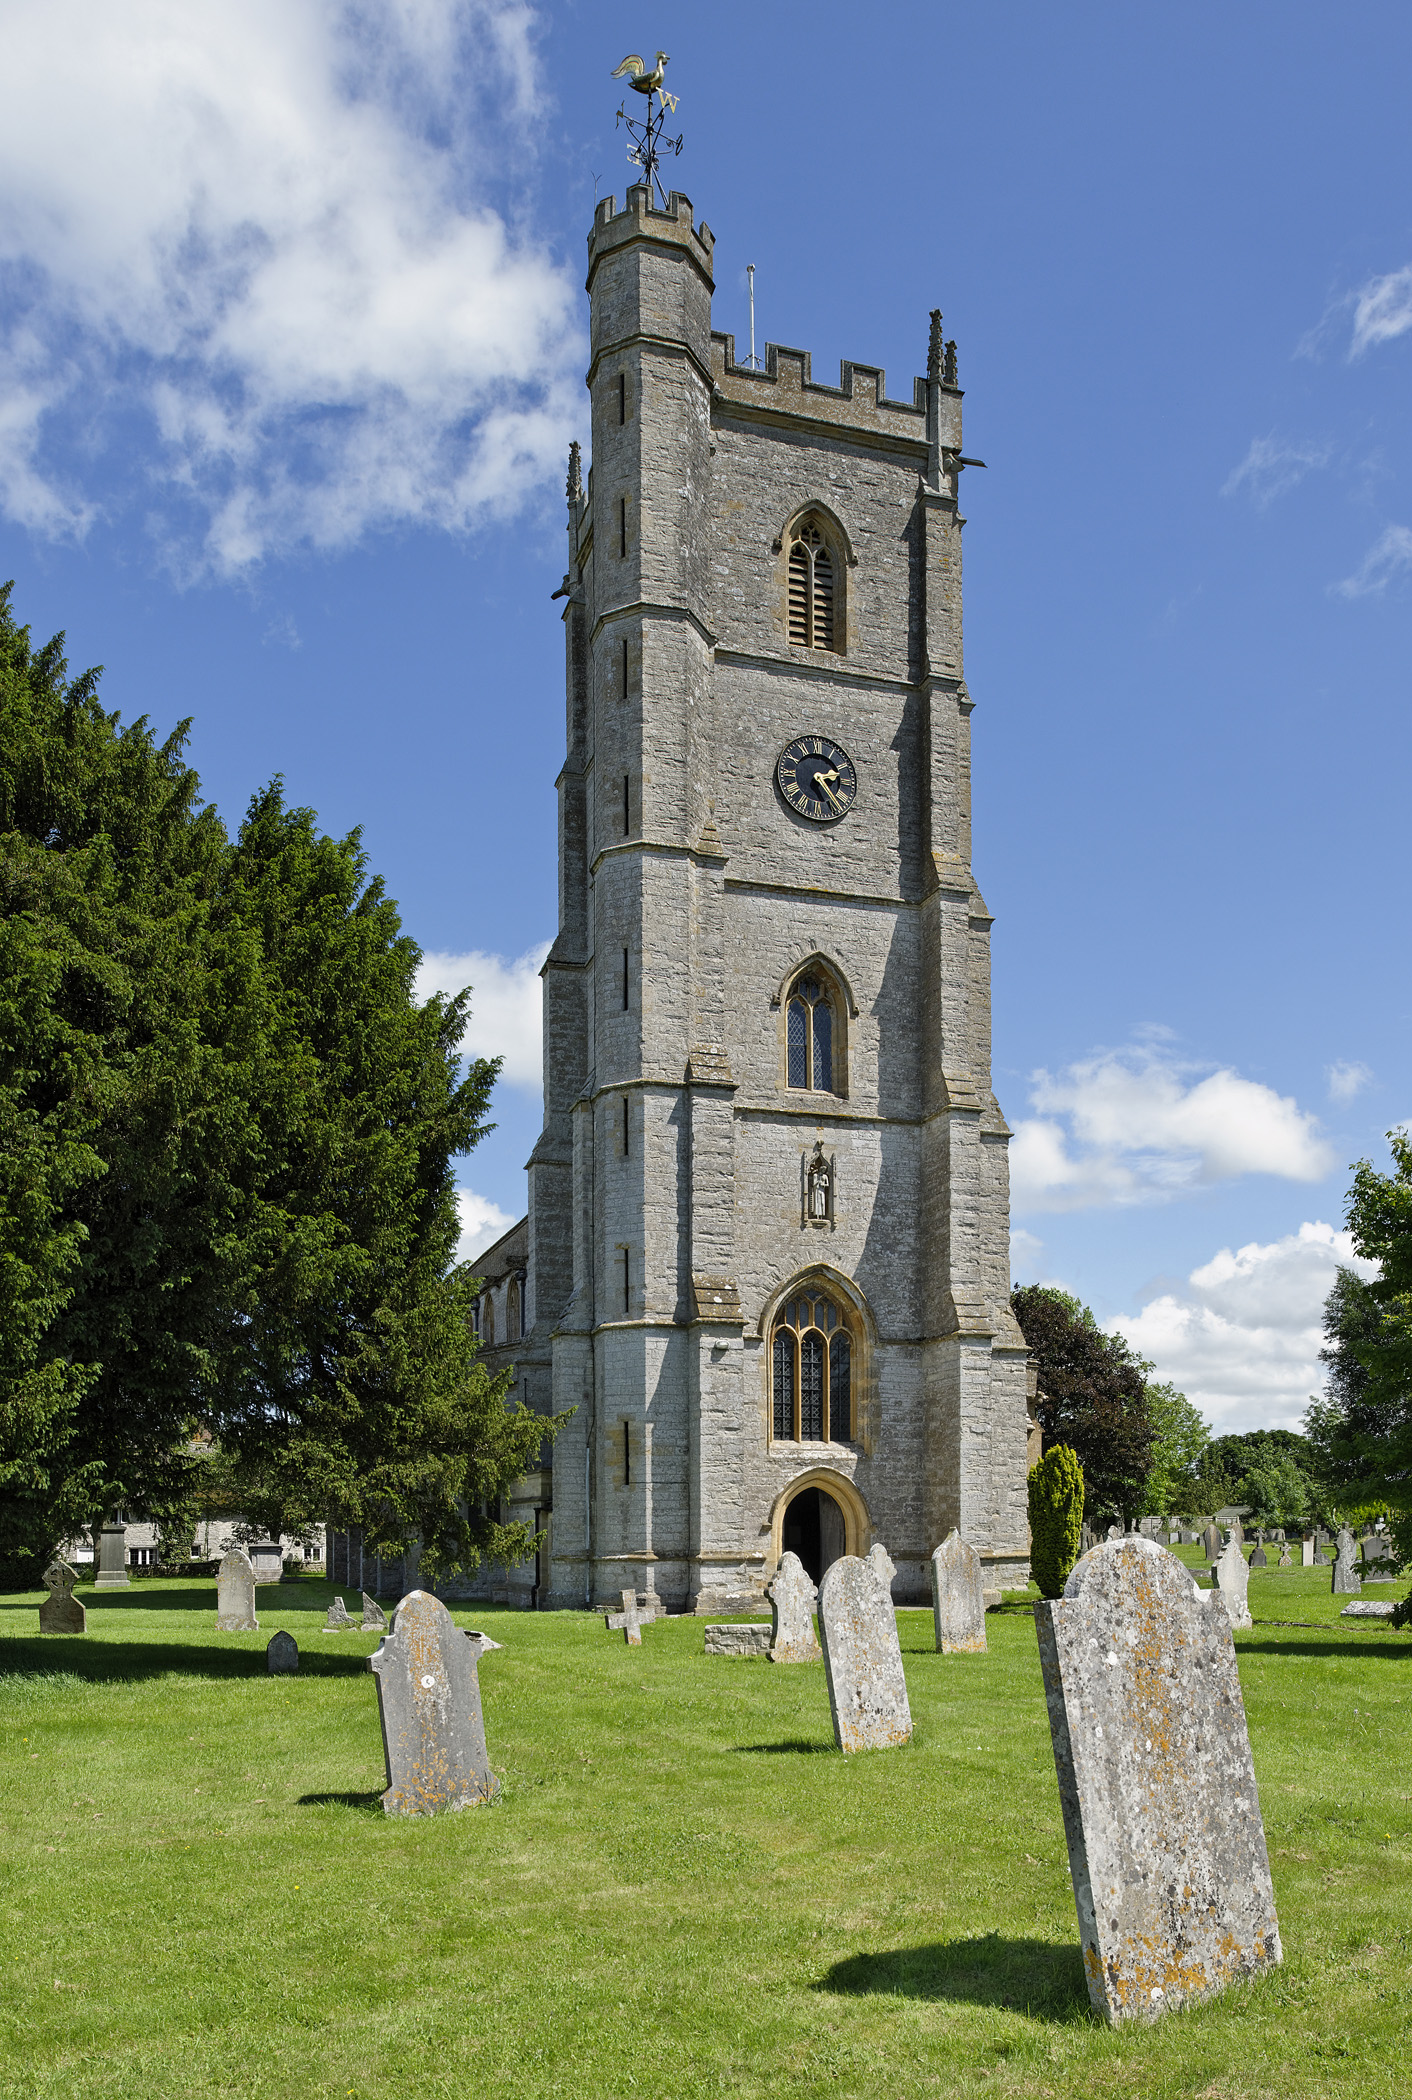 St. Barnabas Church, Queen Camel, Somerset MUST CREDIT (C) Malcom Osman